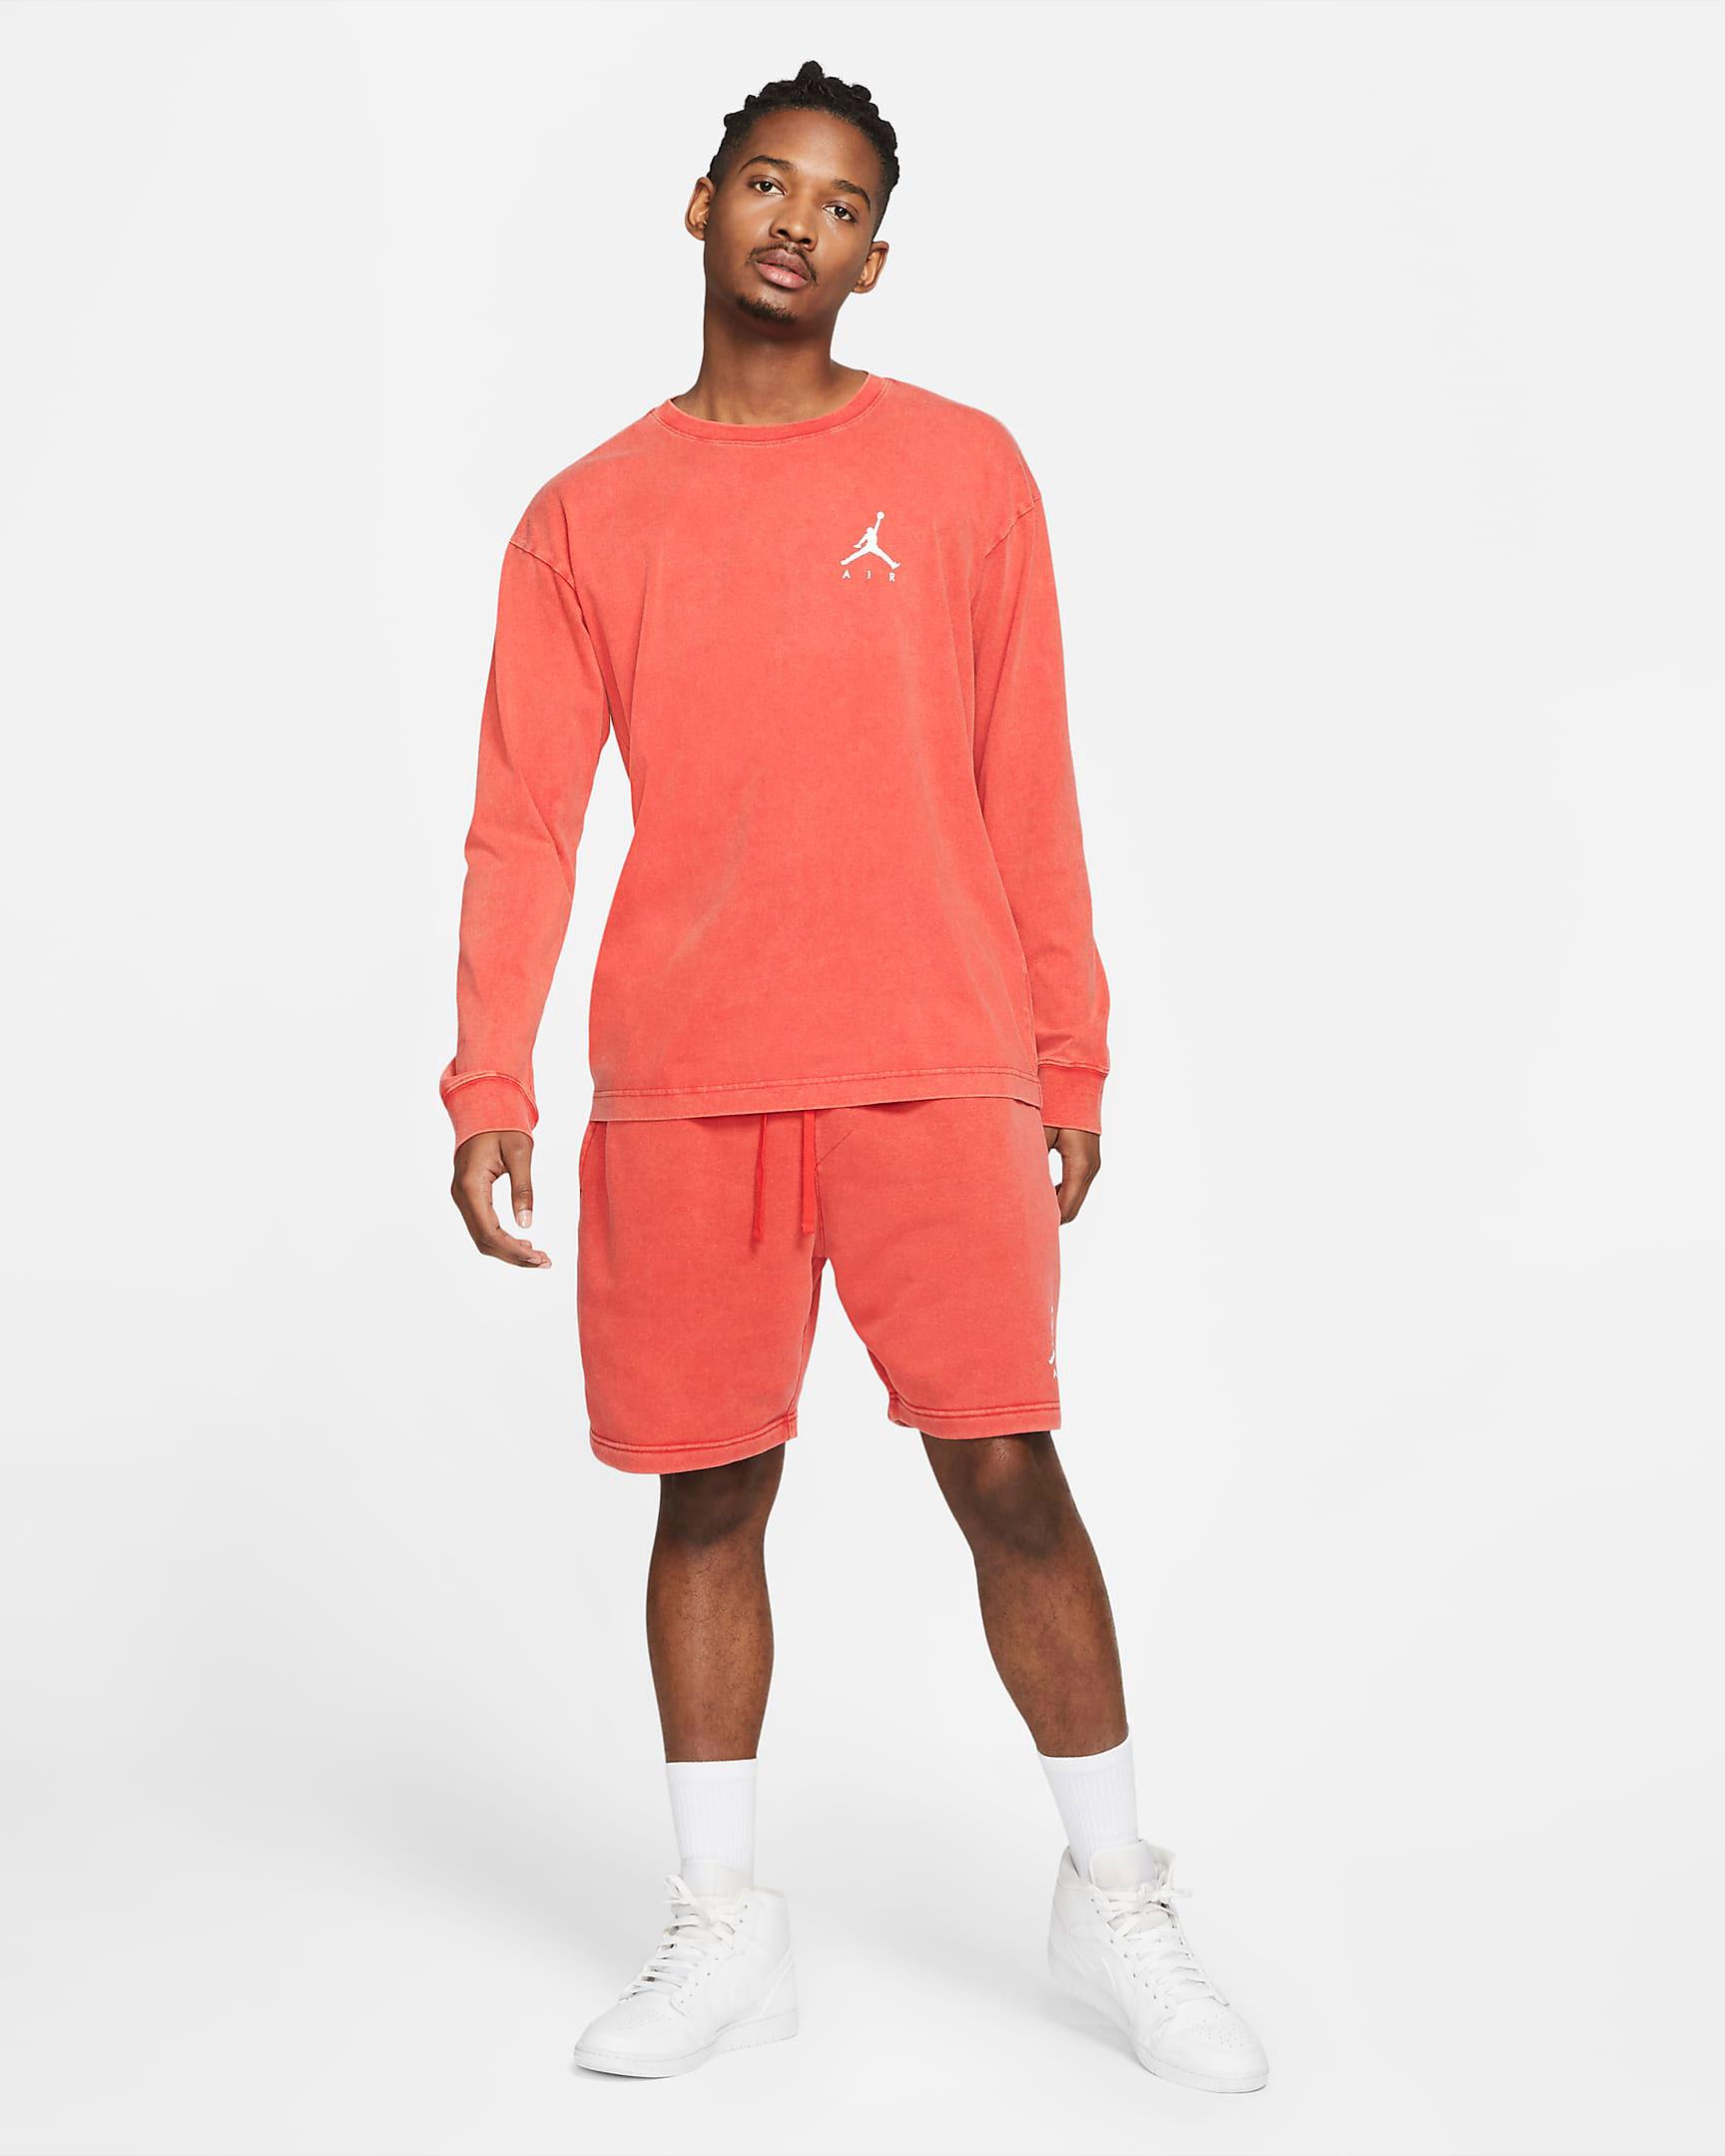 jordan-4-taupe-haze-infrared-shirt-shorts-match